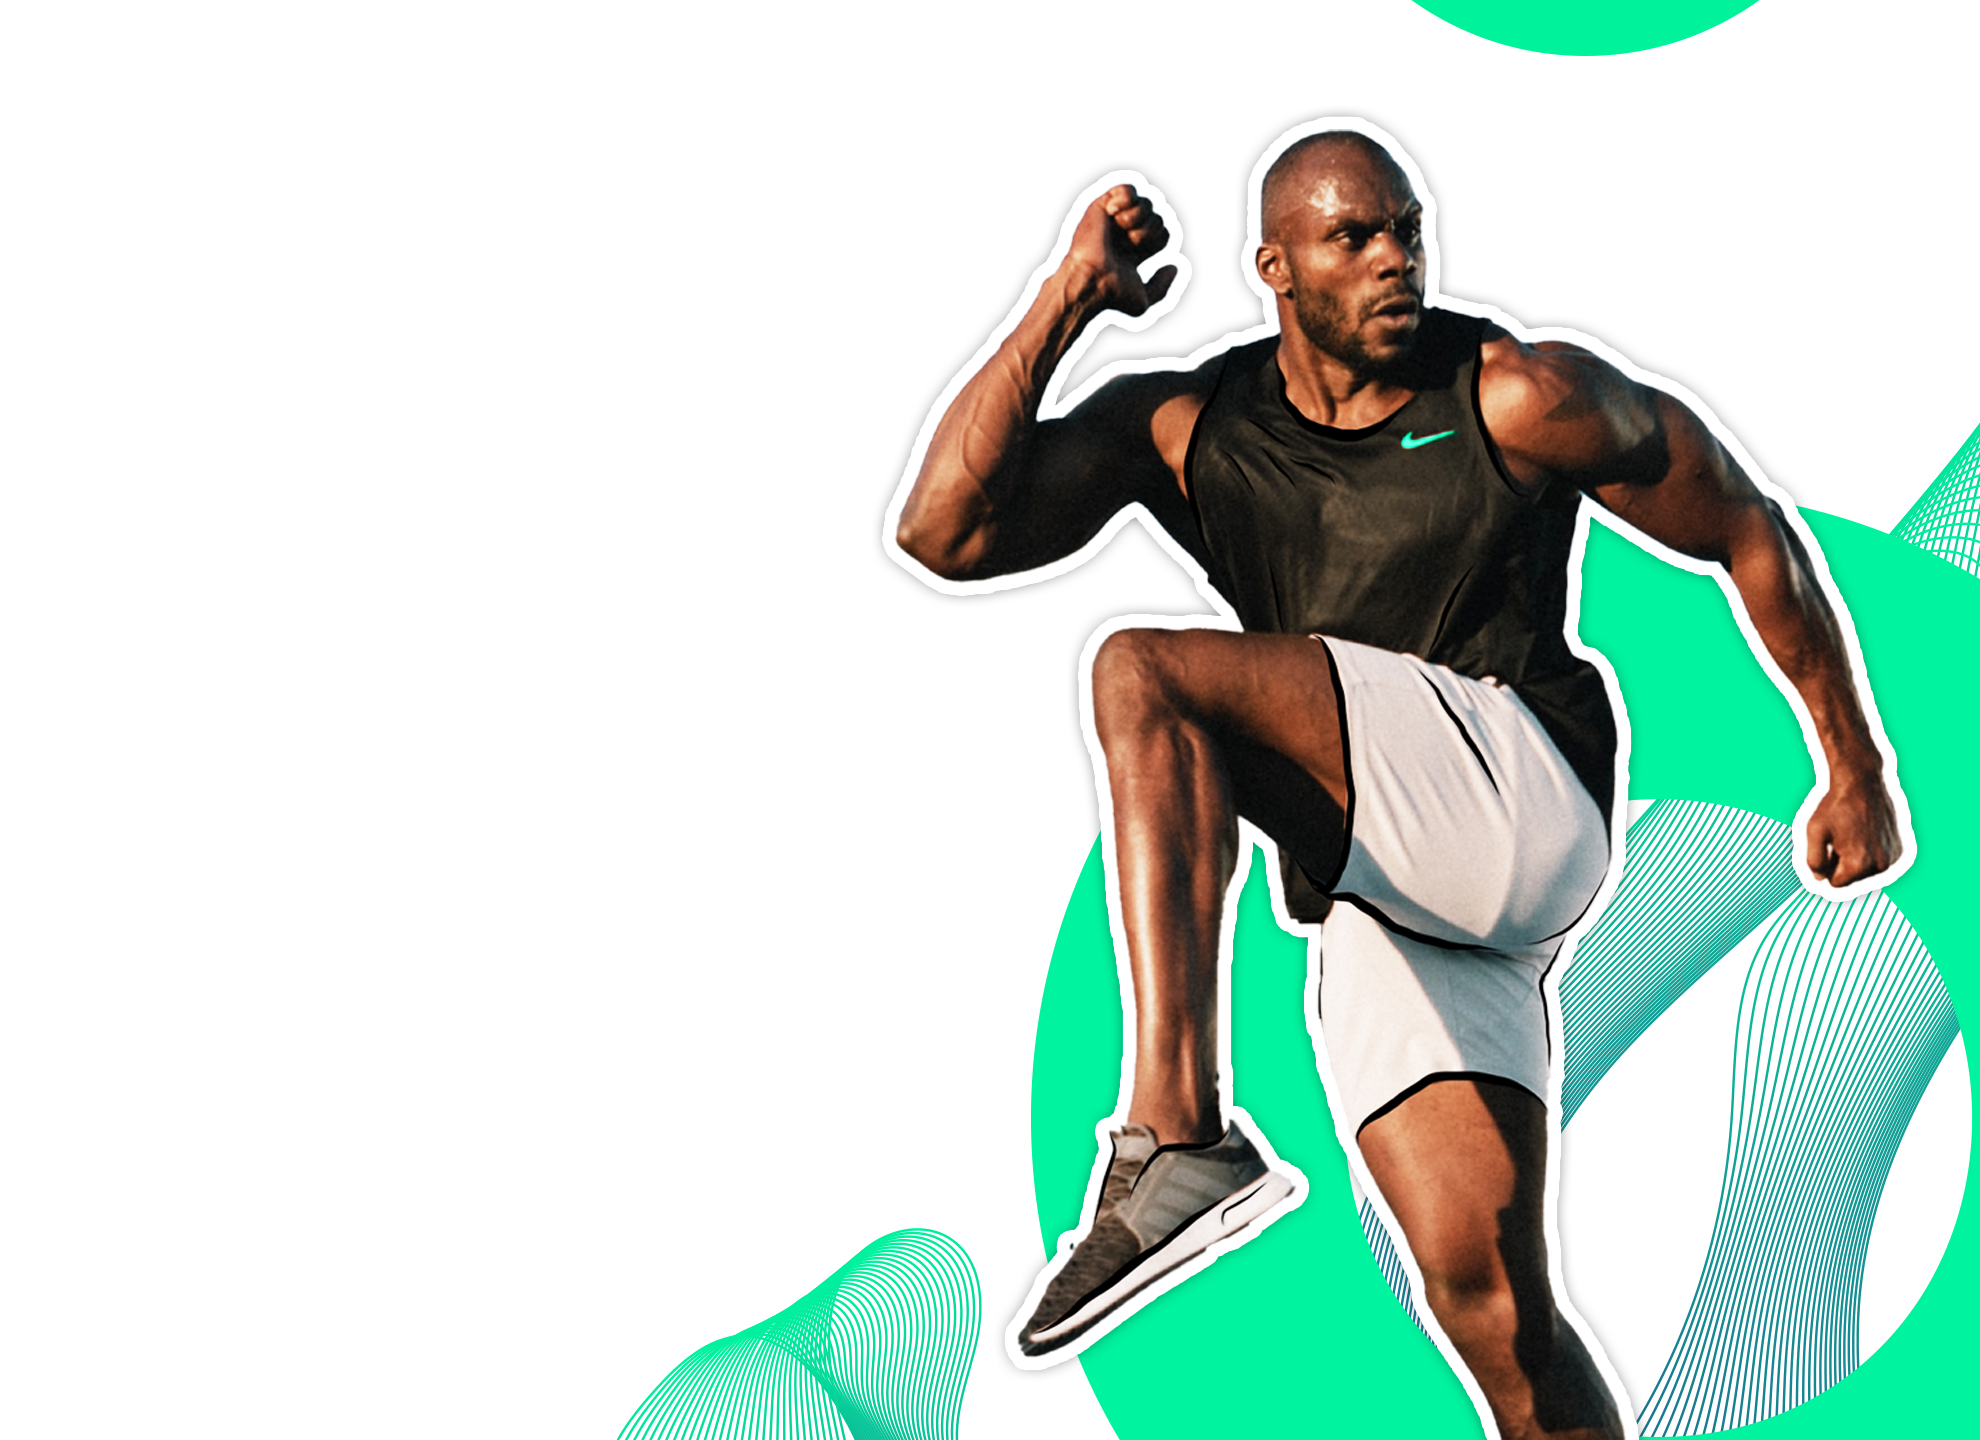 "alt=""Athletic male runner in high performance running gear"""